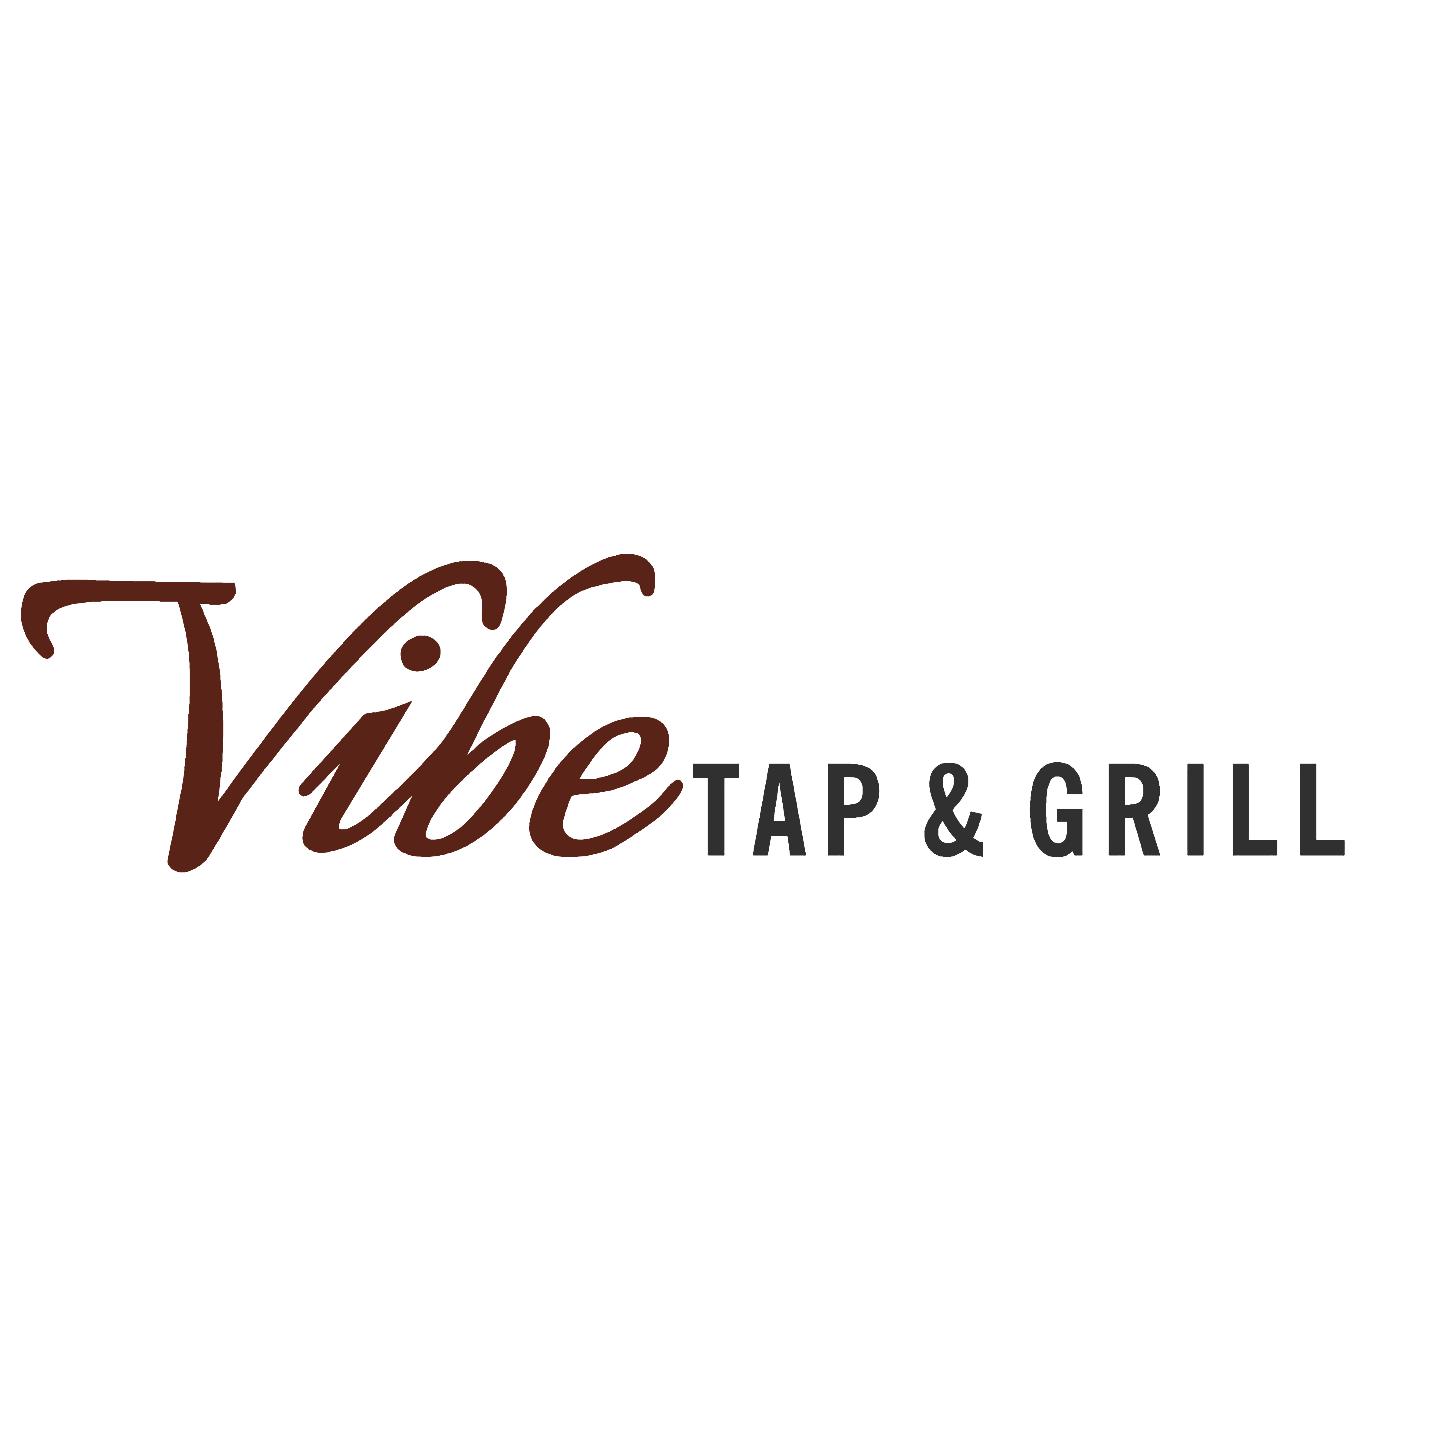 Vibe Tap & Grill - Hazlet, NJ - Restaurants